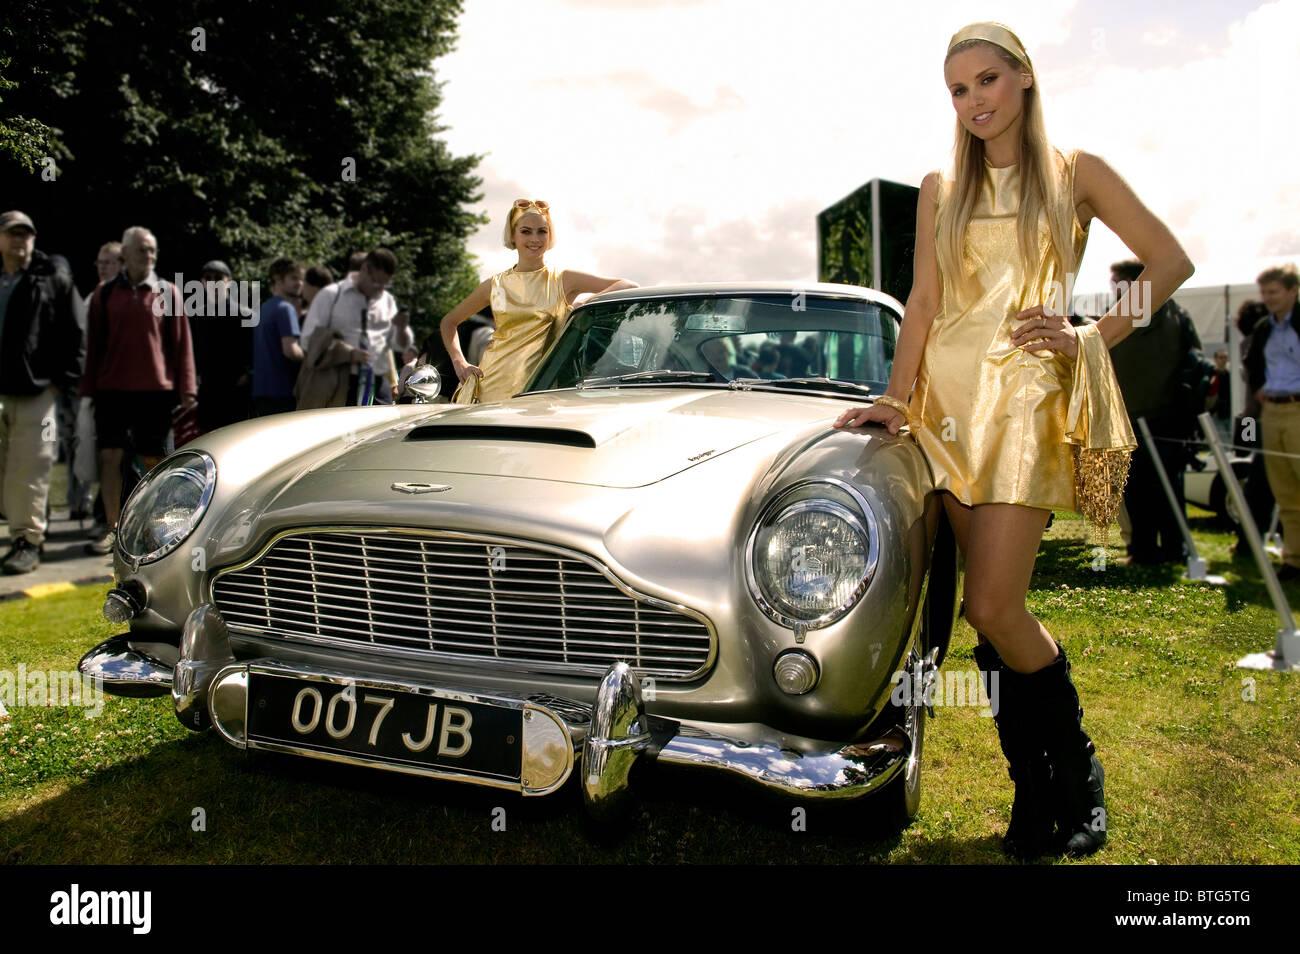 James Bond 007 Aston Martin Db5 Stock Photo 32317952 Alamy